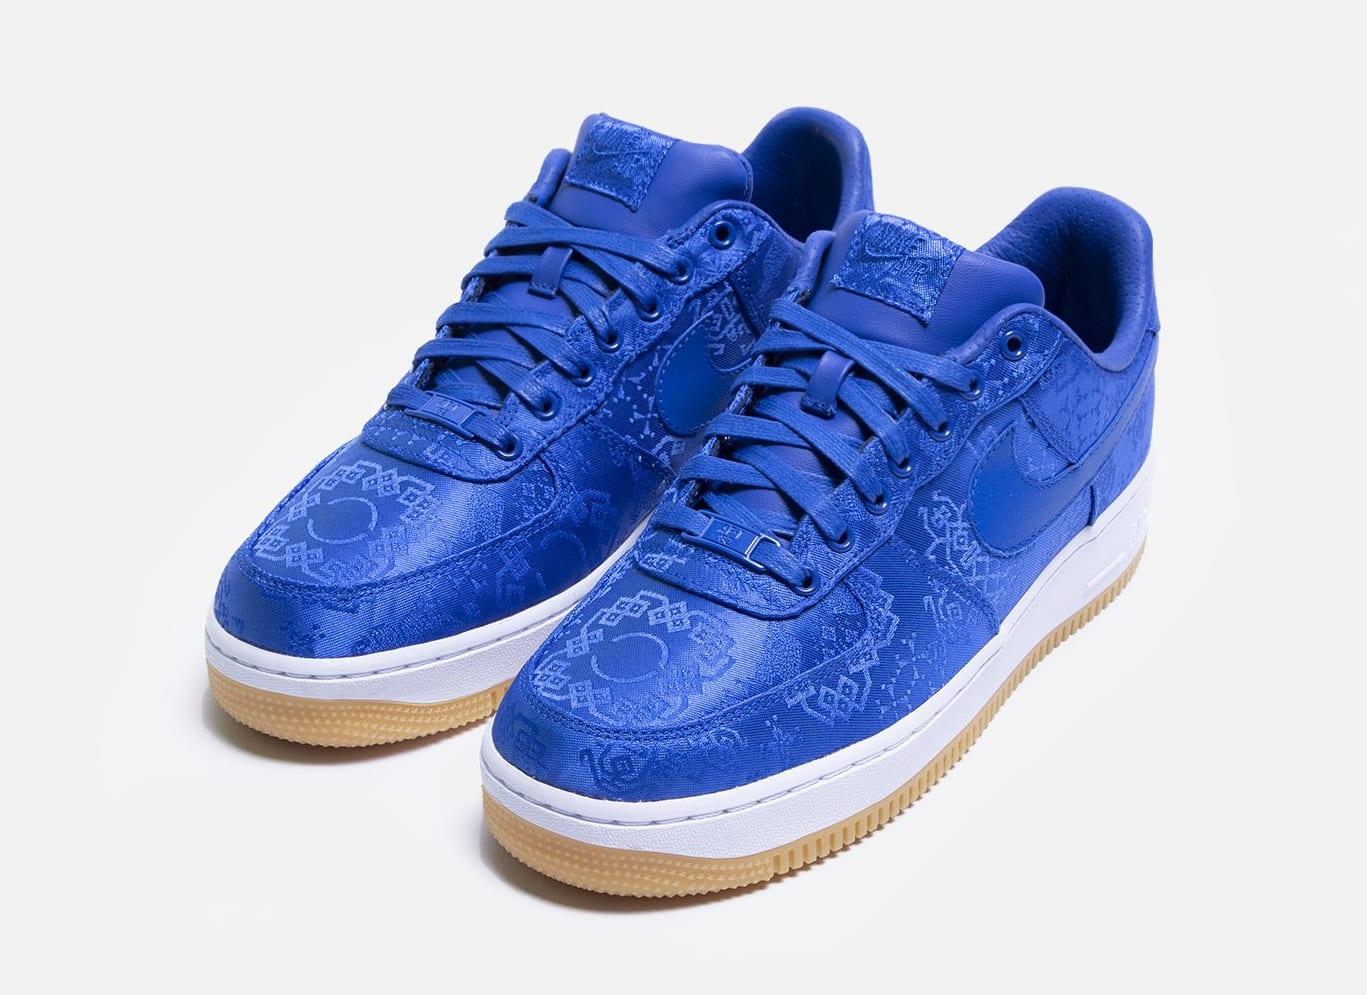 clot-nike-air-force-1-low-royal-university-blue-silk-toe